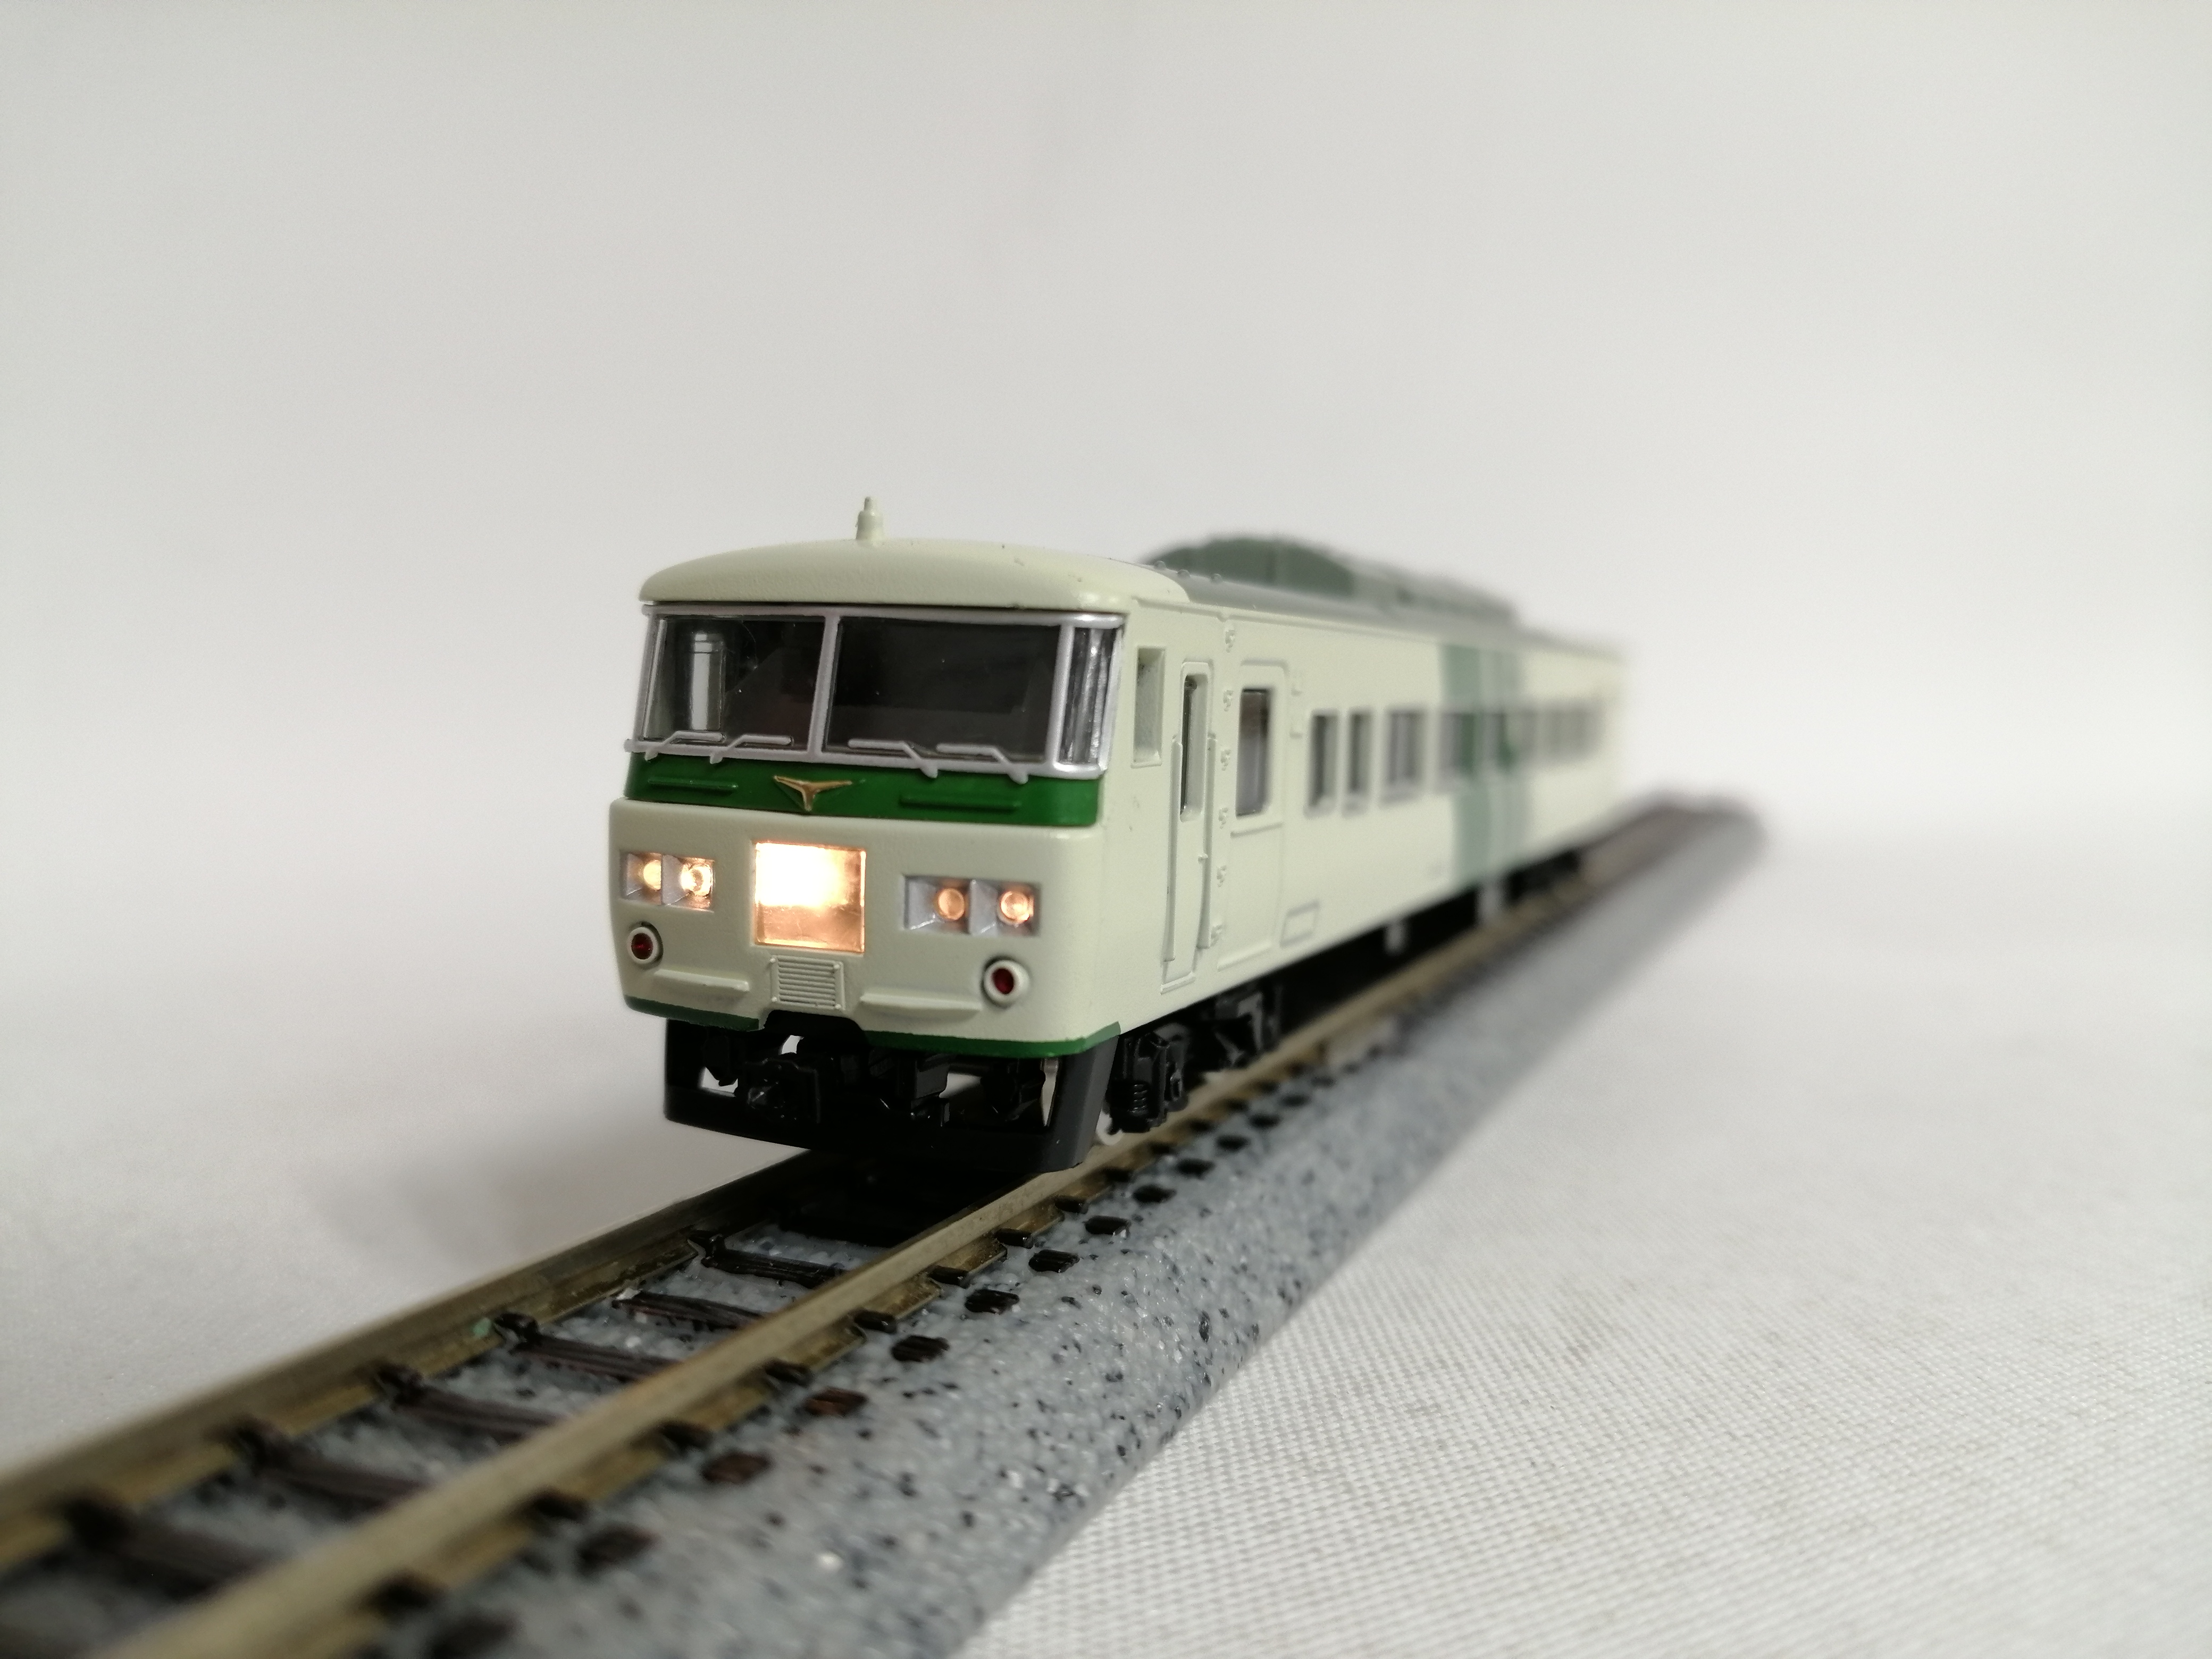 Nゲージ JR185系 特急電車 TOMIX